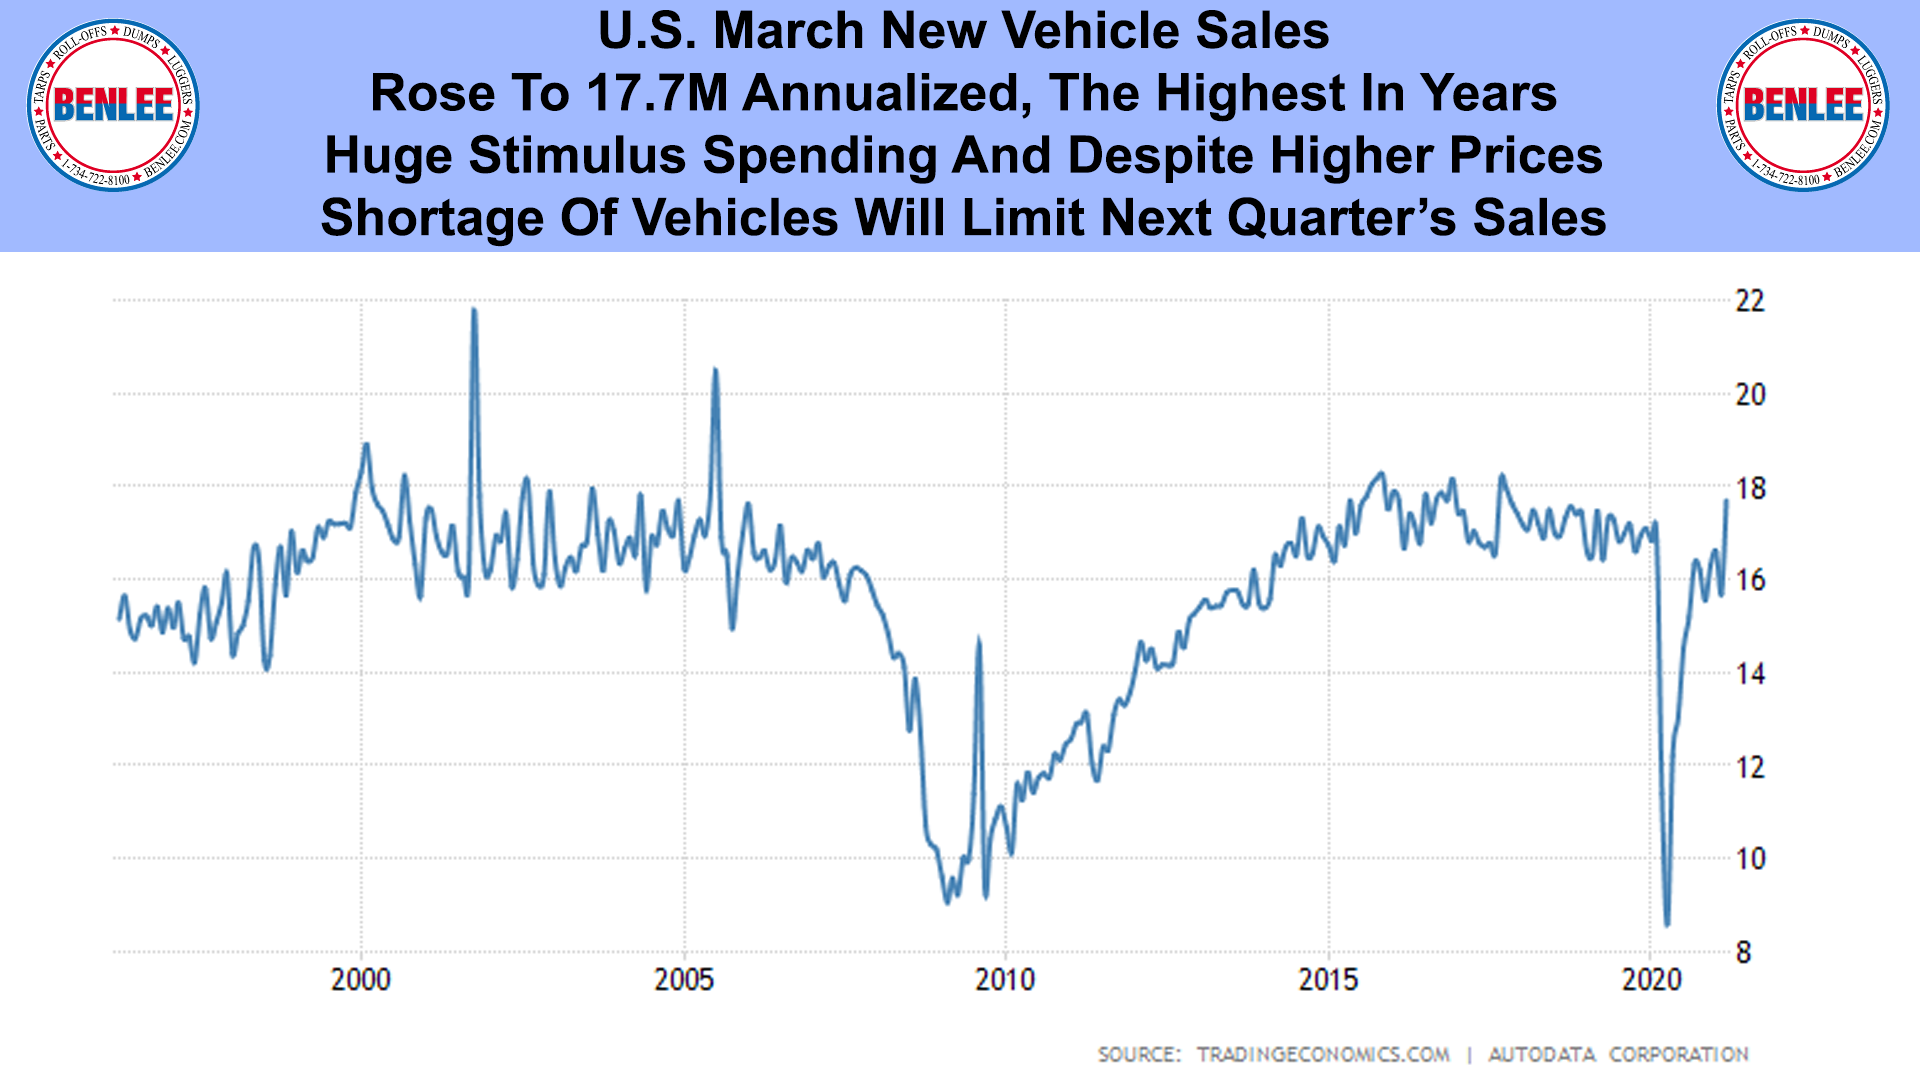 U.S. March New Vehicle Sales